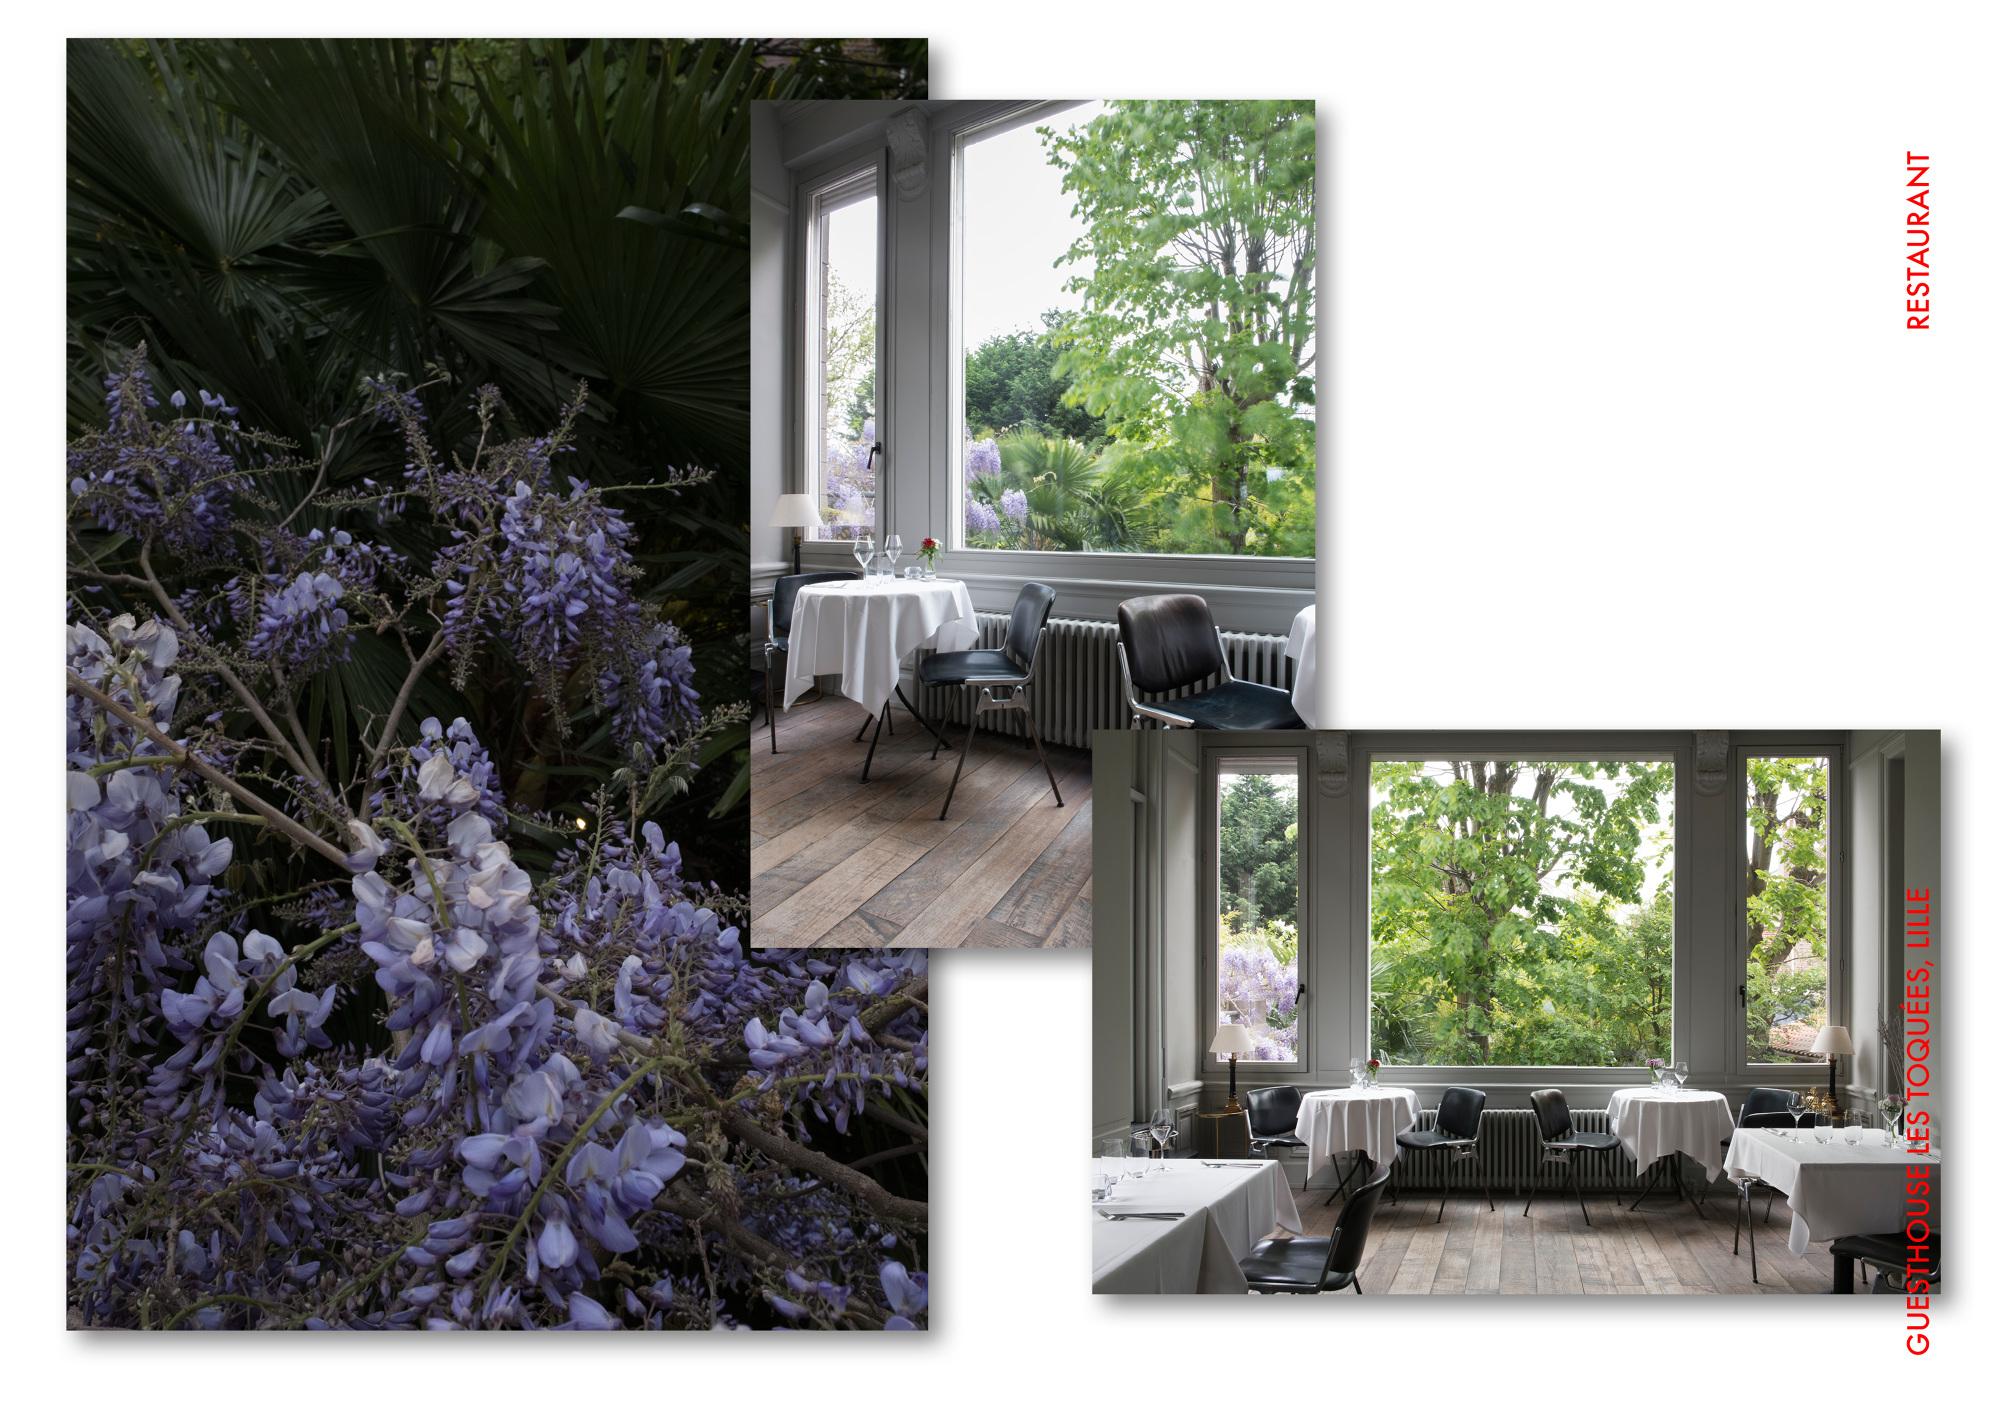 les toqu es studio greiling. Black Bedroom Furniture Sets. Home Design Ideas